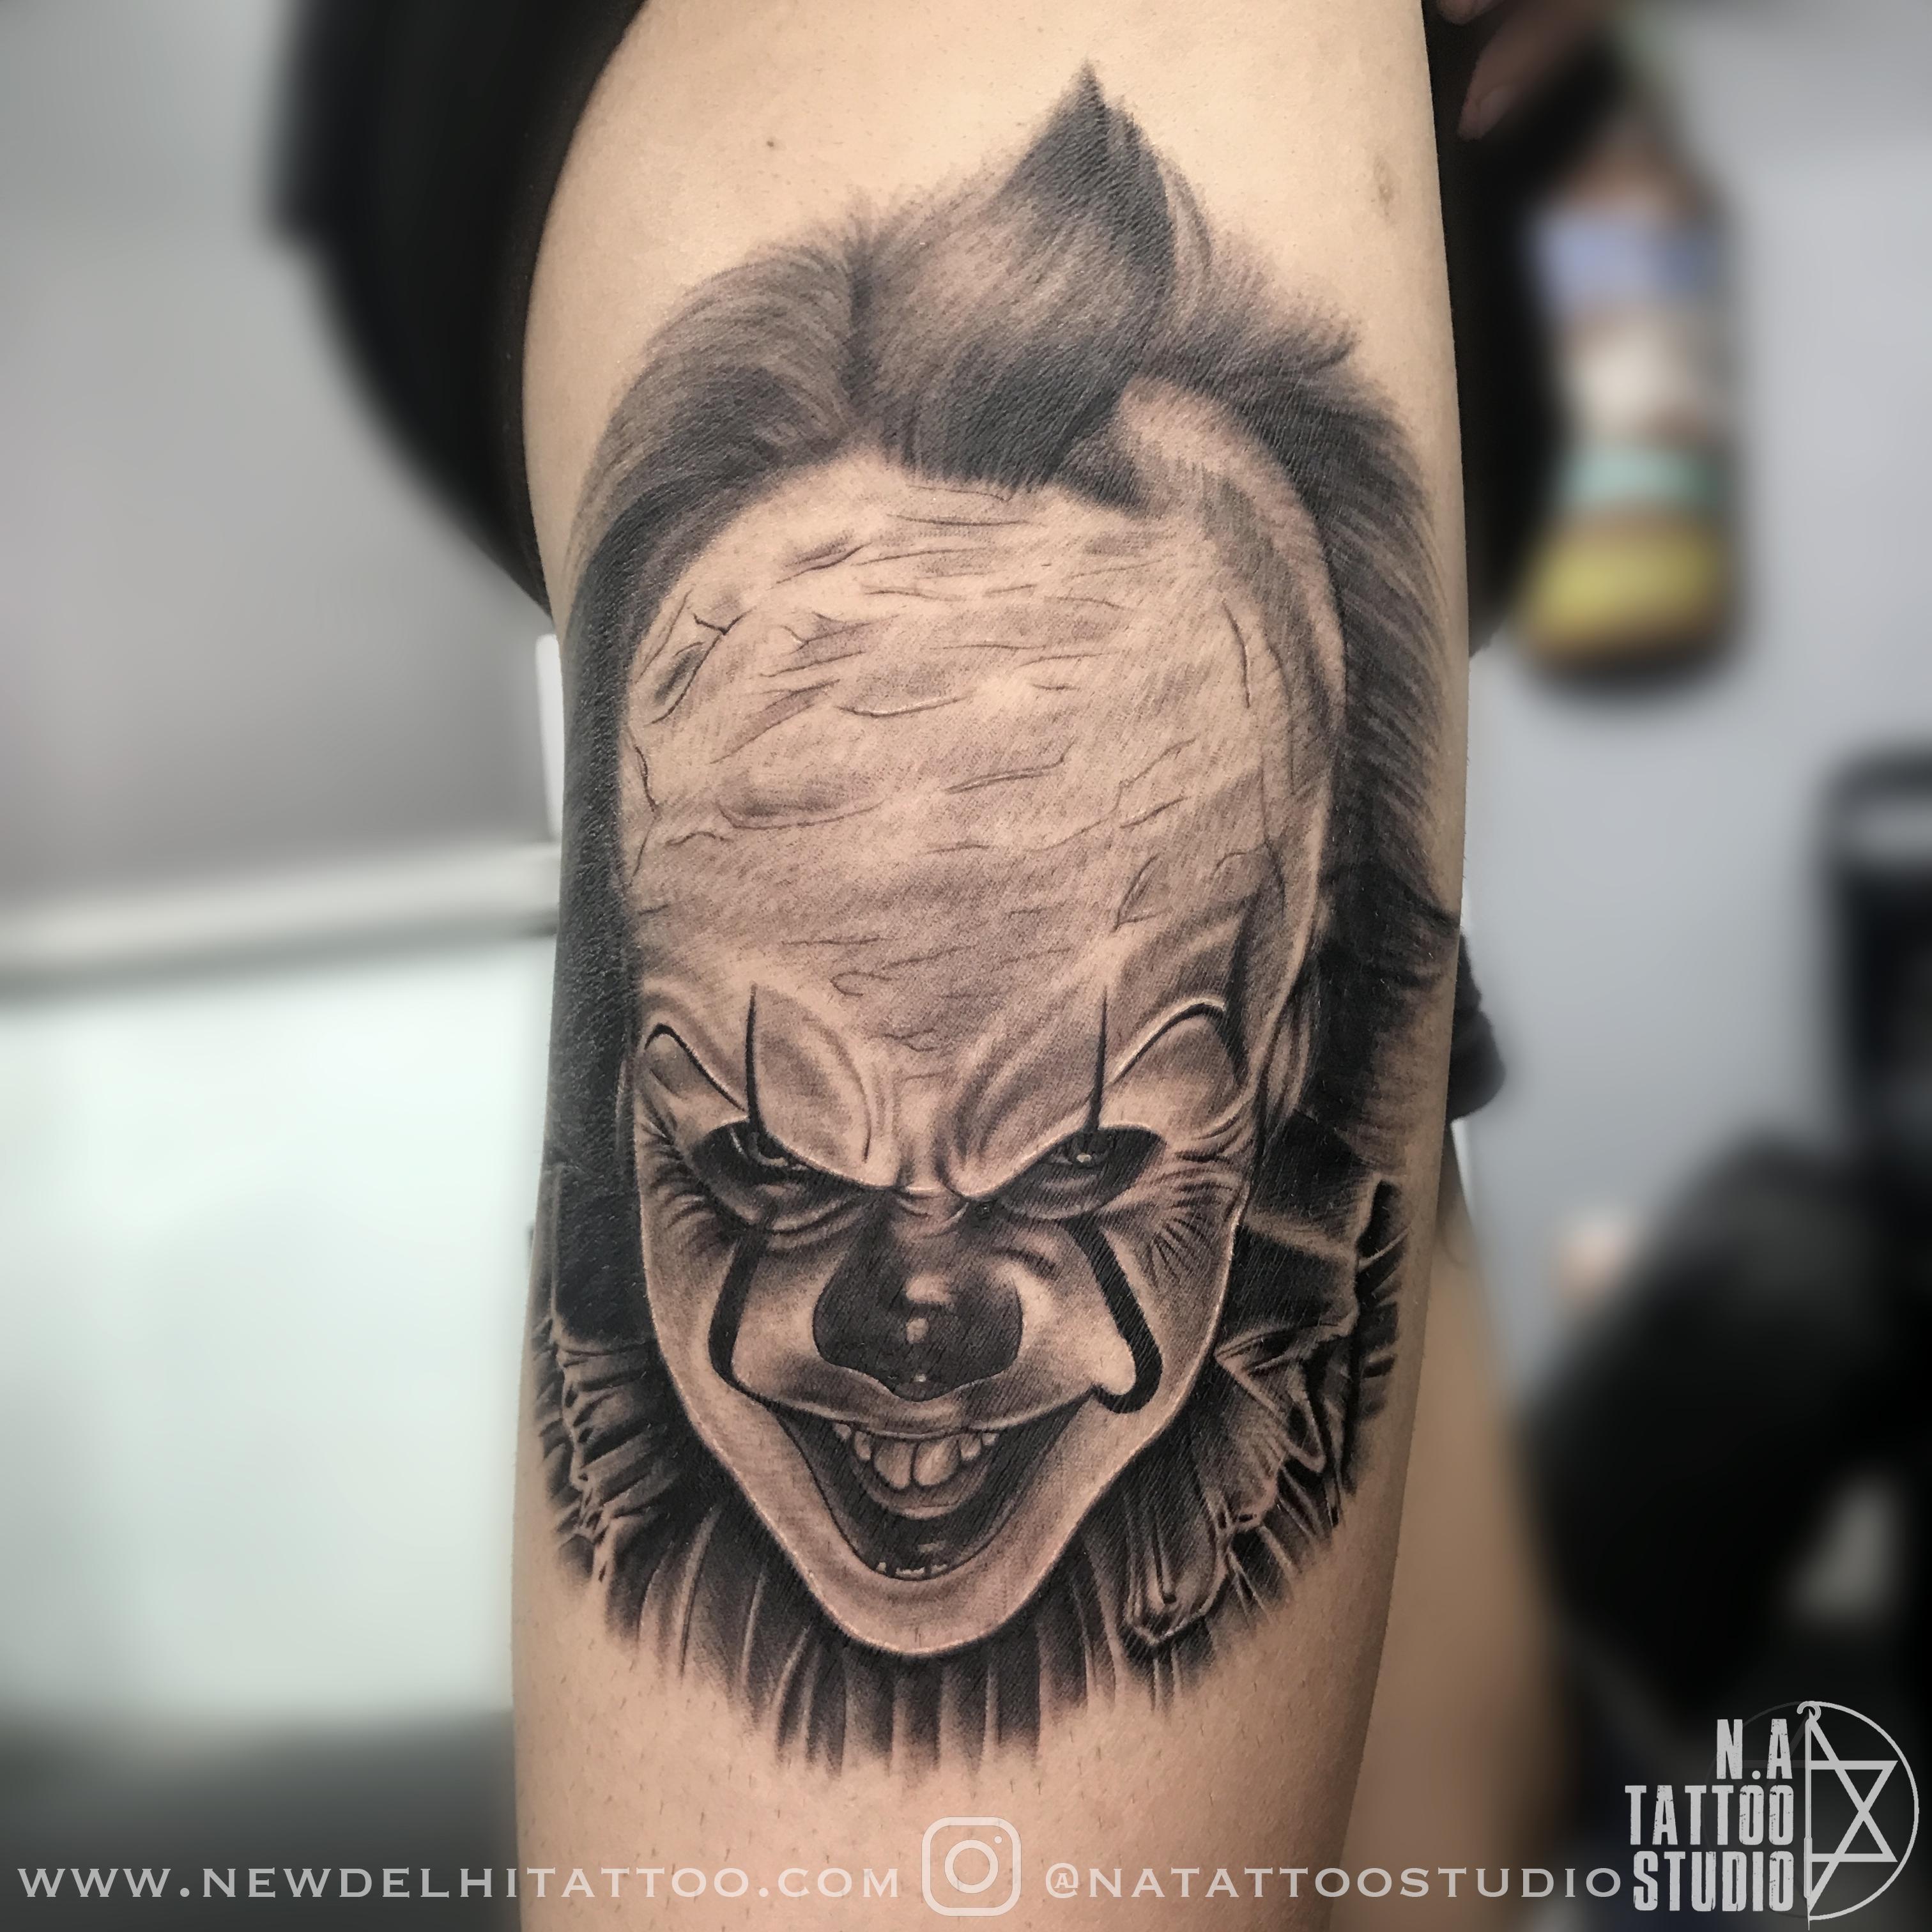 pennywise-tattoo-newdelhitattoo